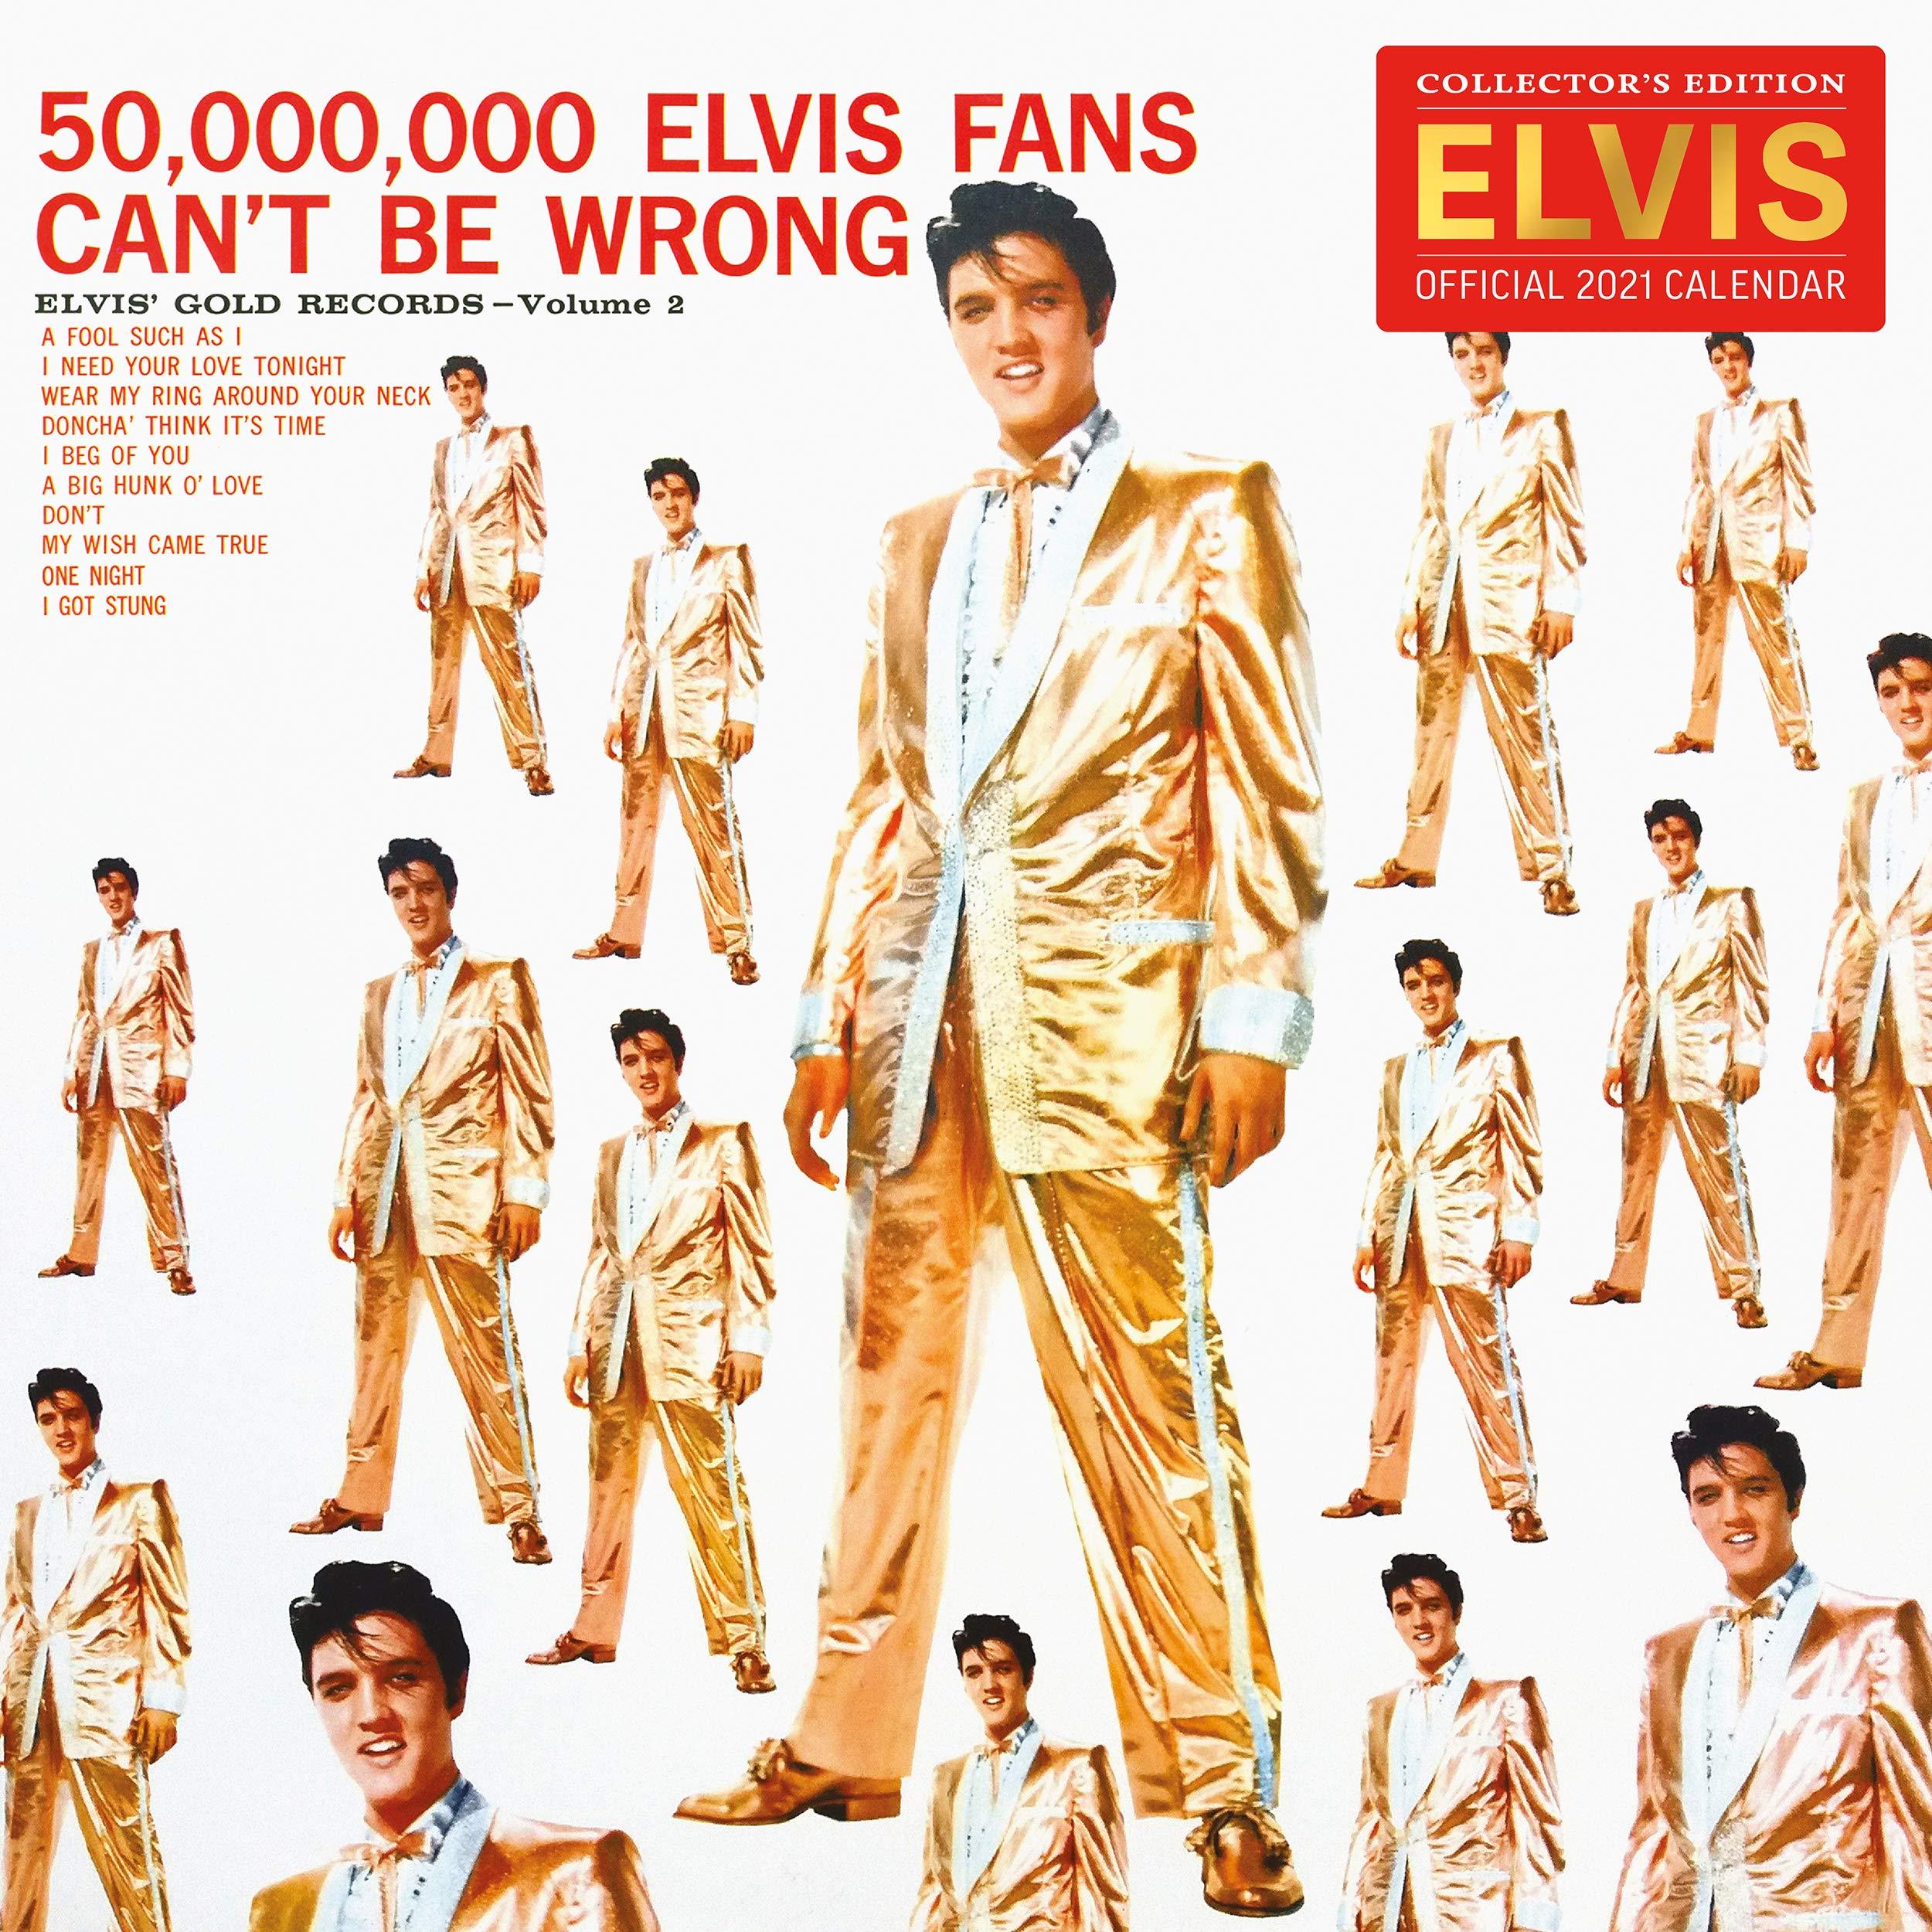 Elvis 2021 Calendar A3